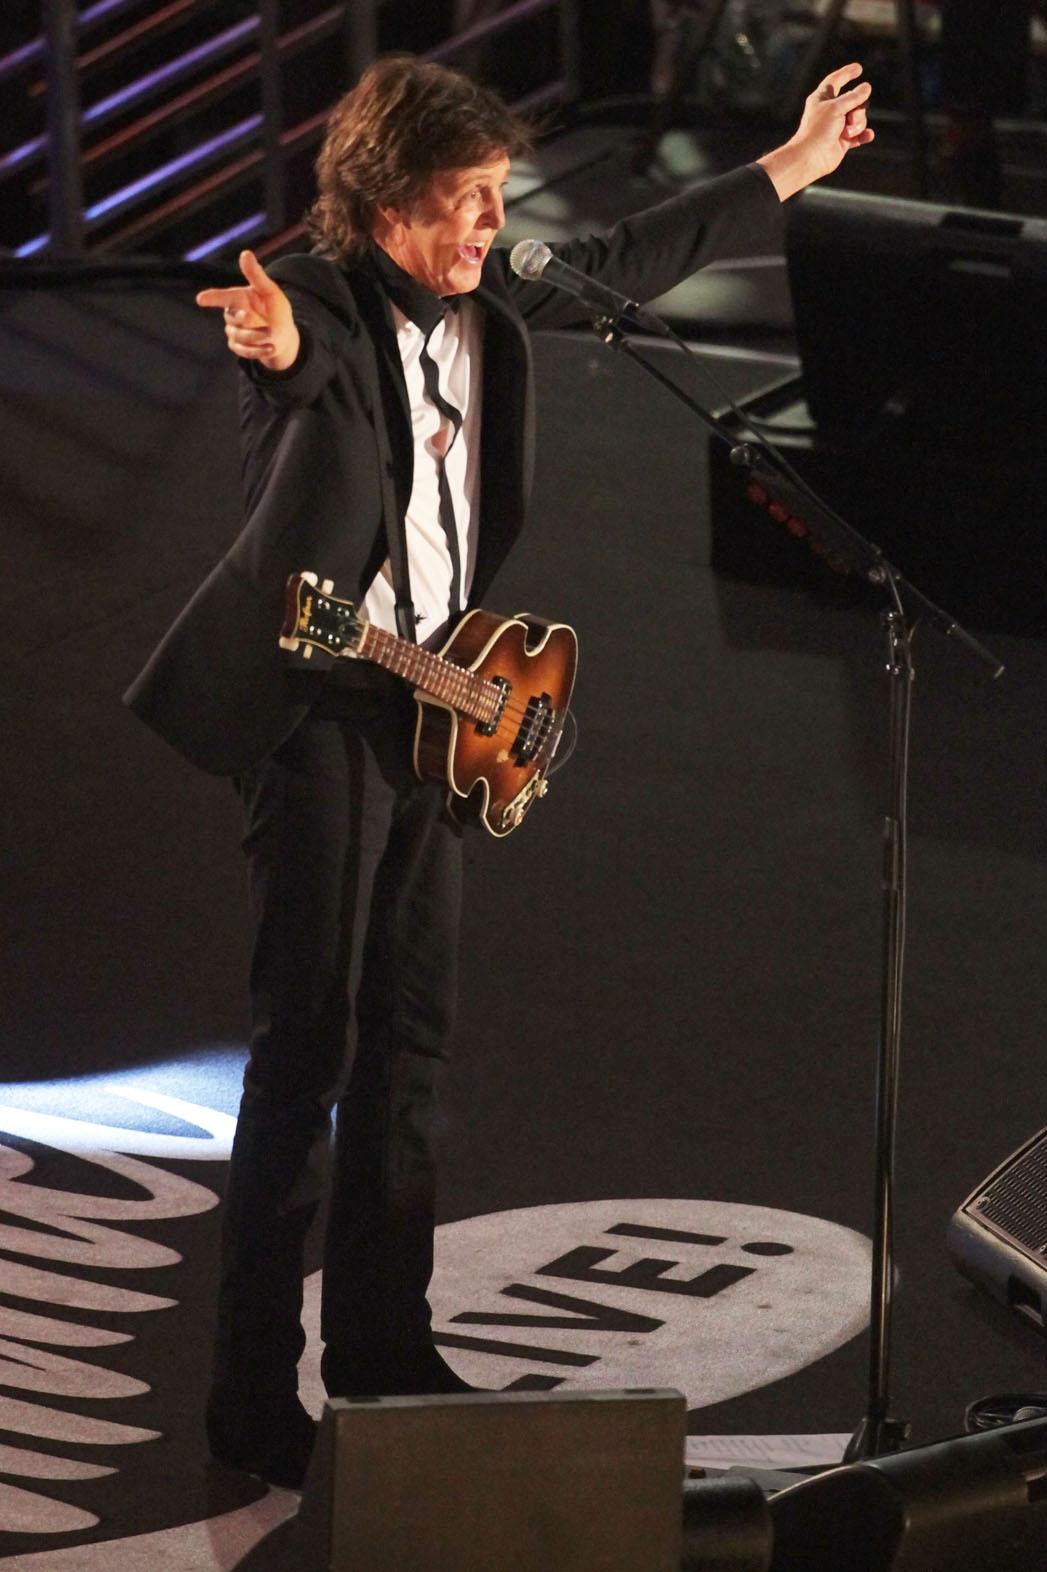 Paul McCartney Jimmy Kimmel Live - P 2013